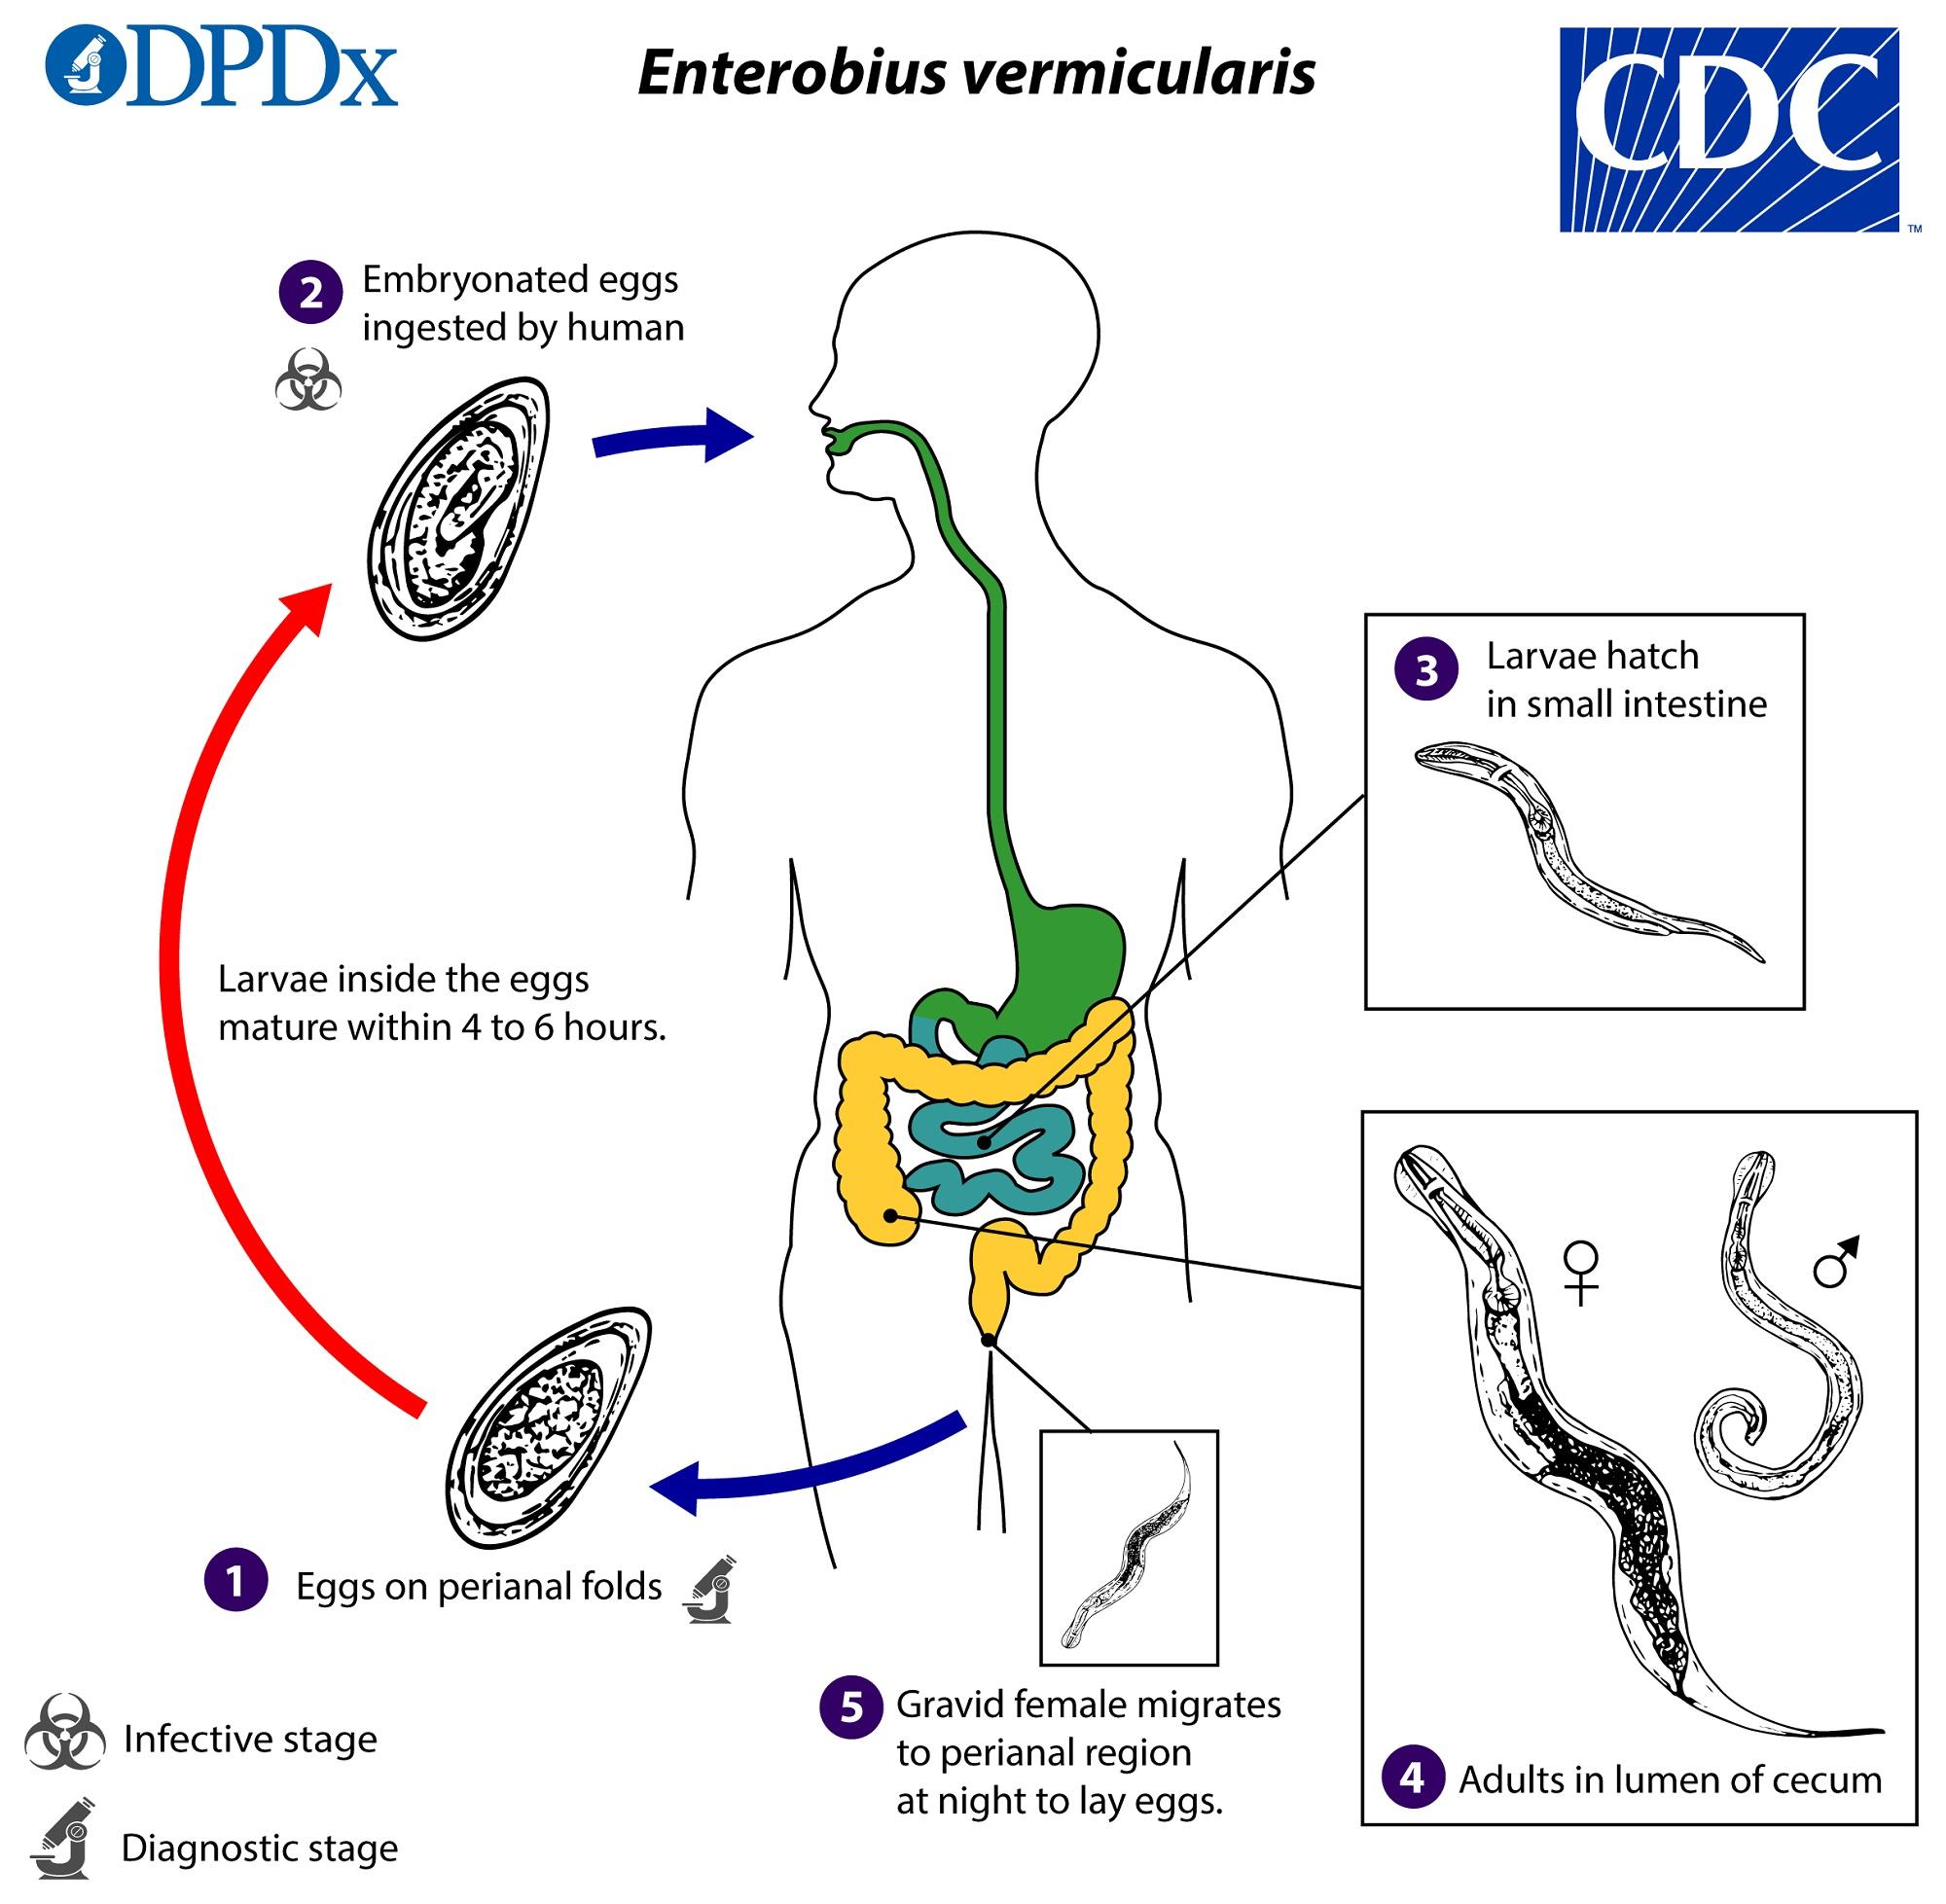 vagy féreg rotund enterobius vermicularis peték